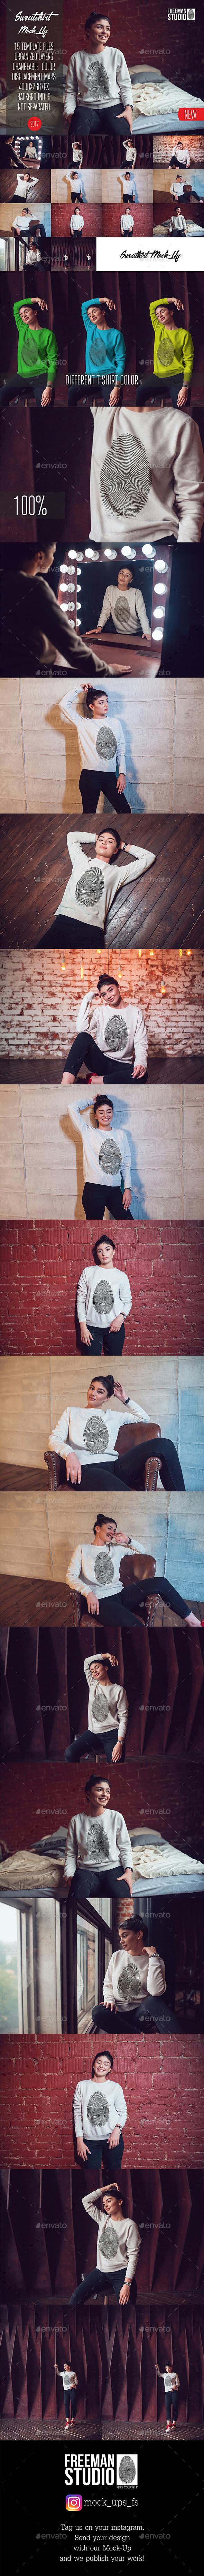 Sweatshirt Mock-Up Vol.7 2017 - Product Mock-Ups Graphics